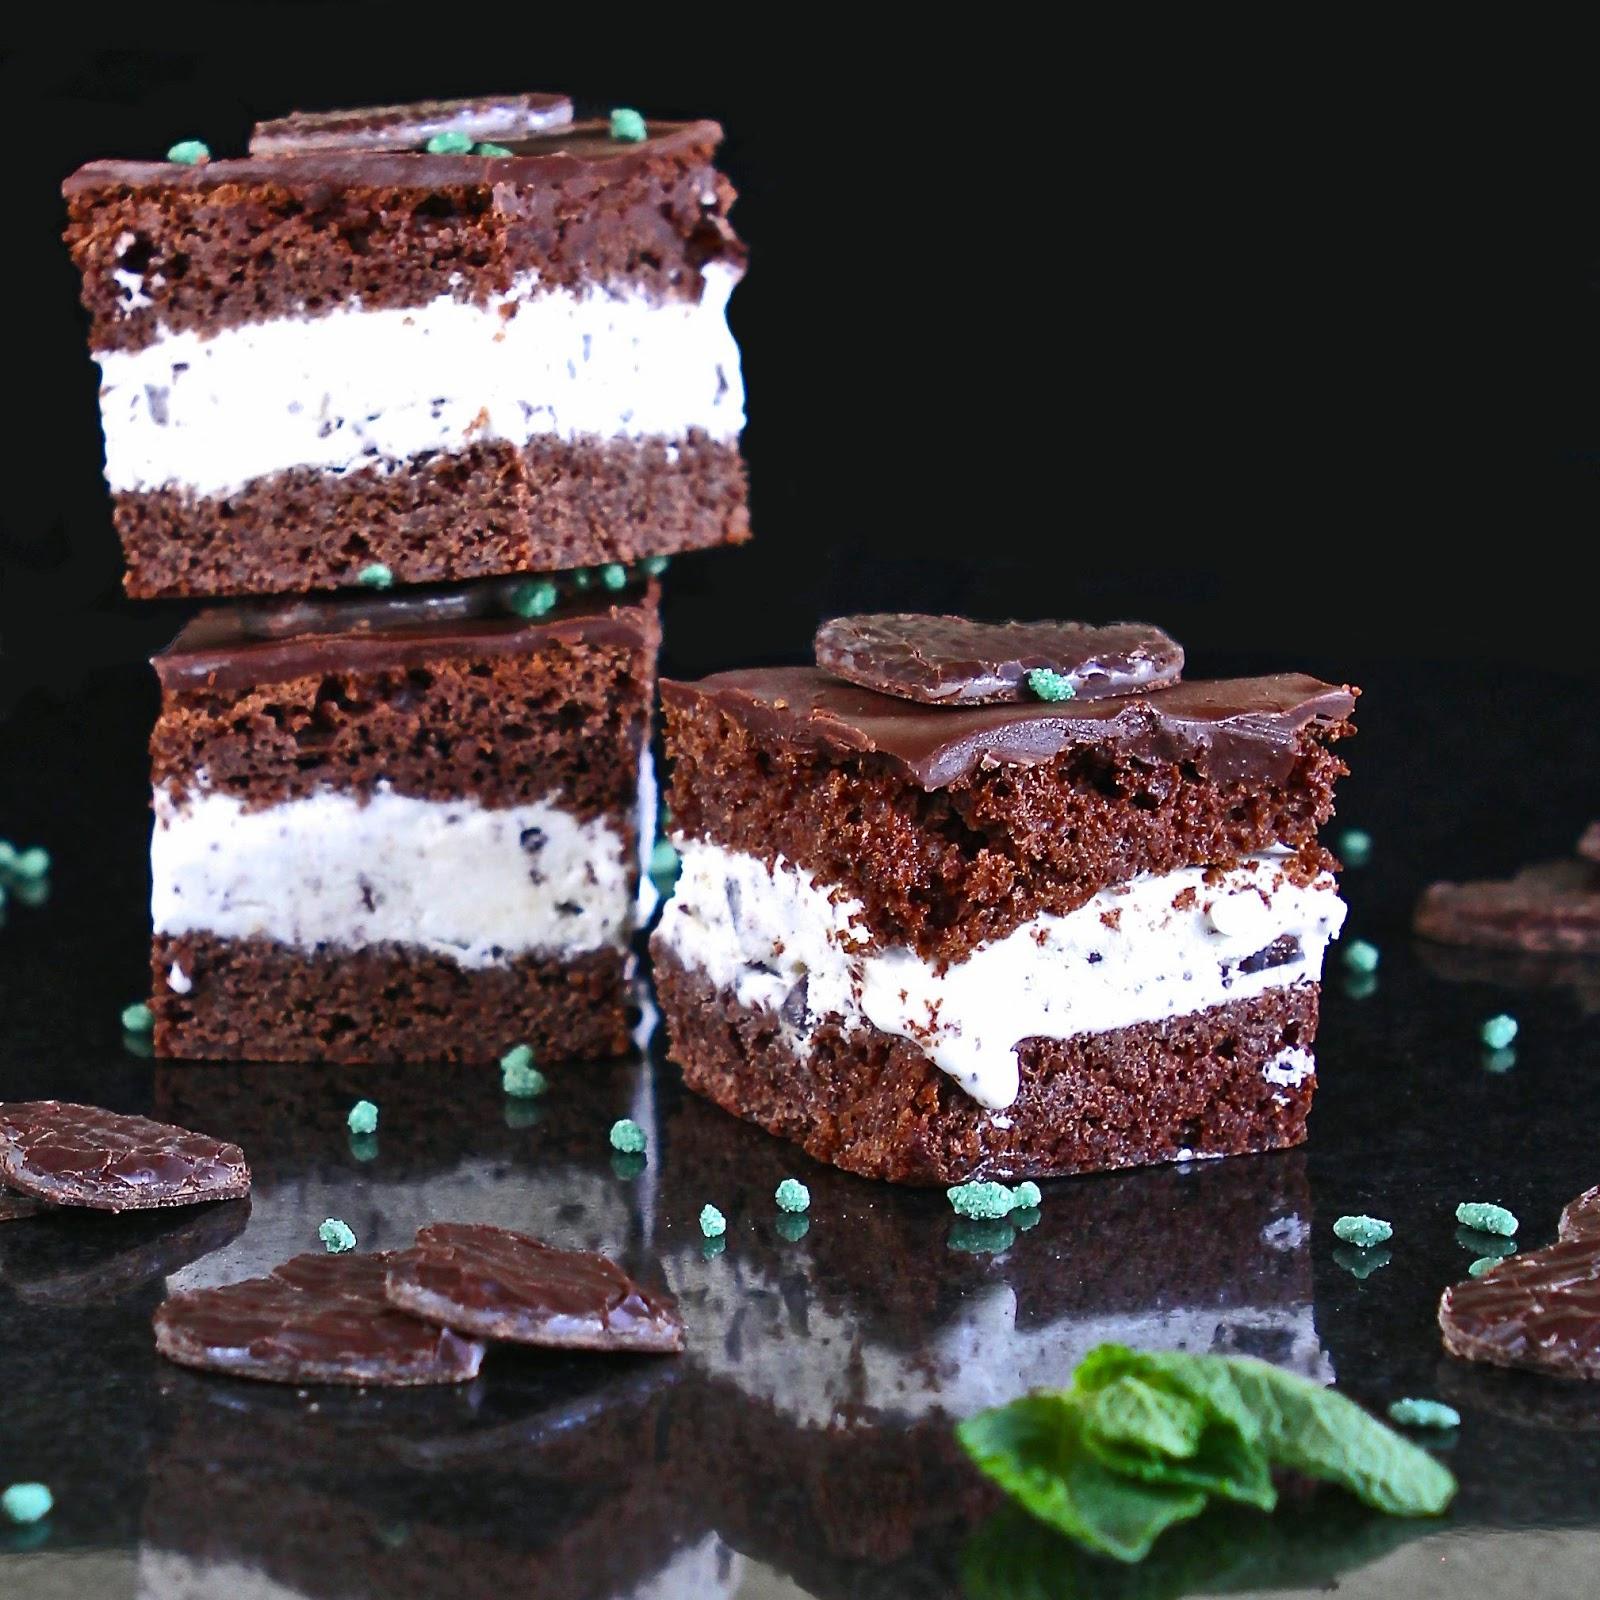 Mint Chocolate Sponge Cake